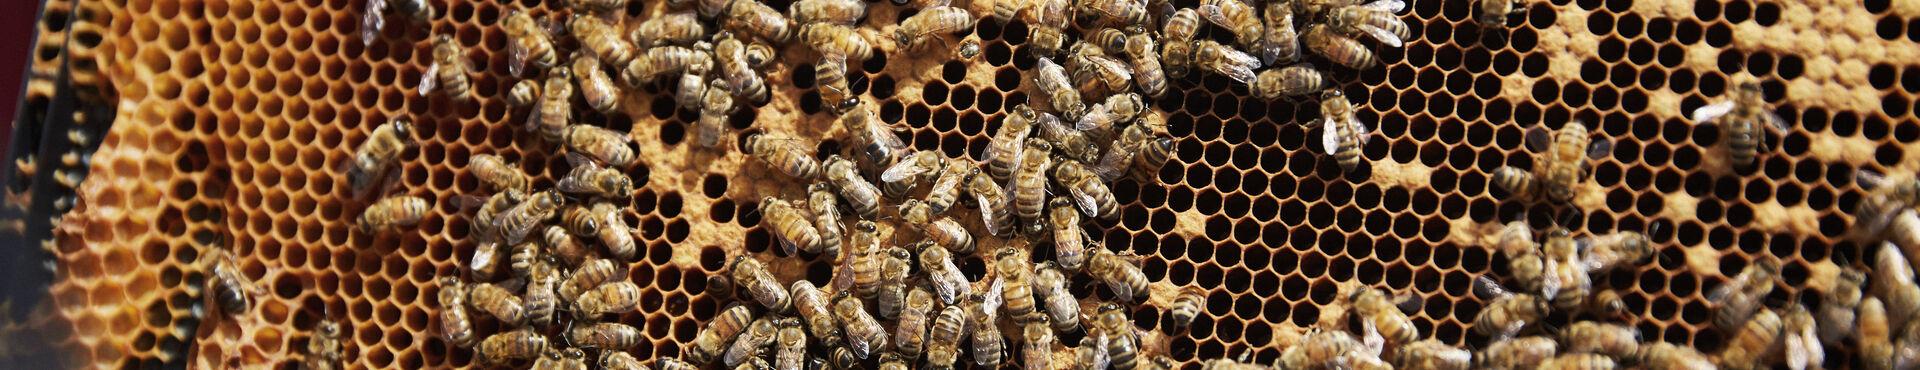 Banner - Why We Use Honey